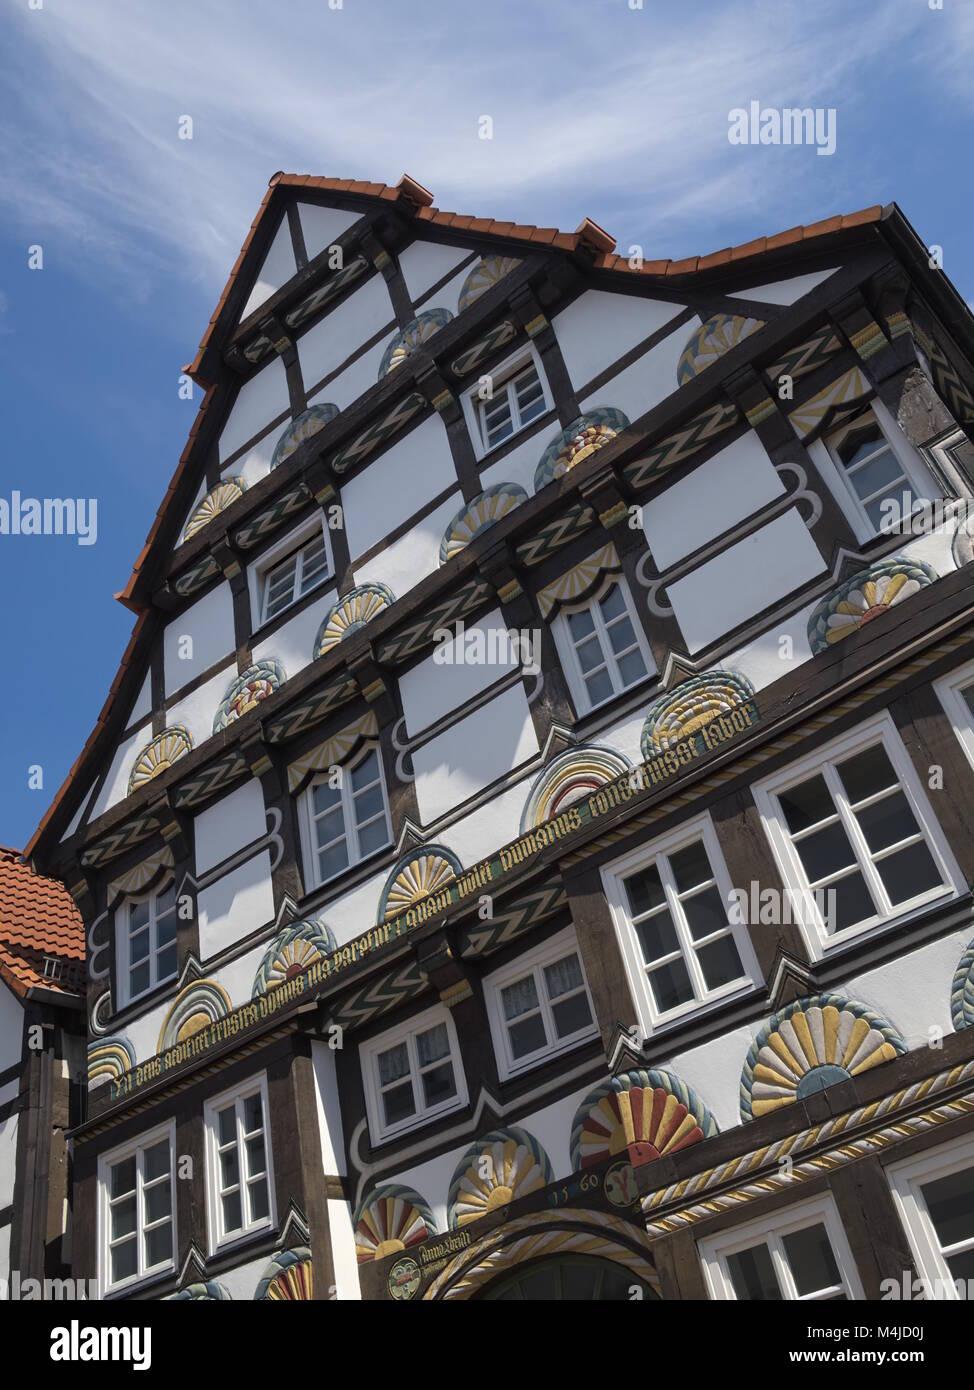 Hamelin - Half-timbered house, Germany - Stock Image